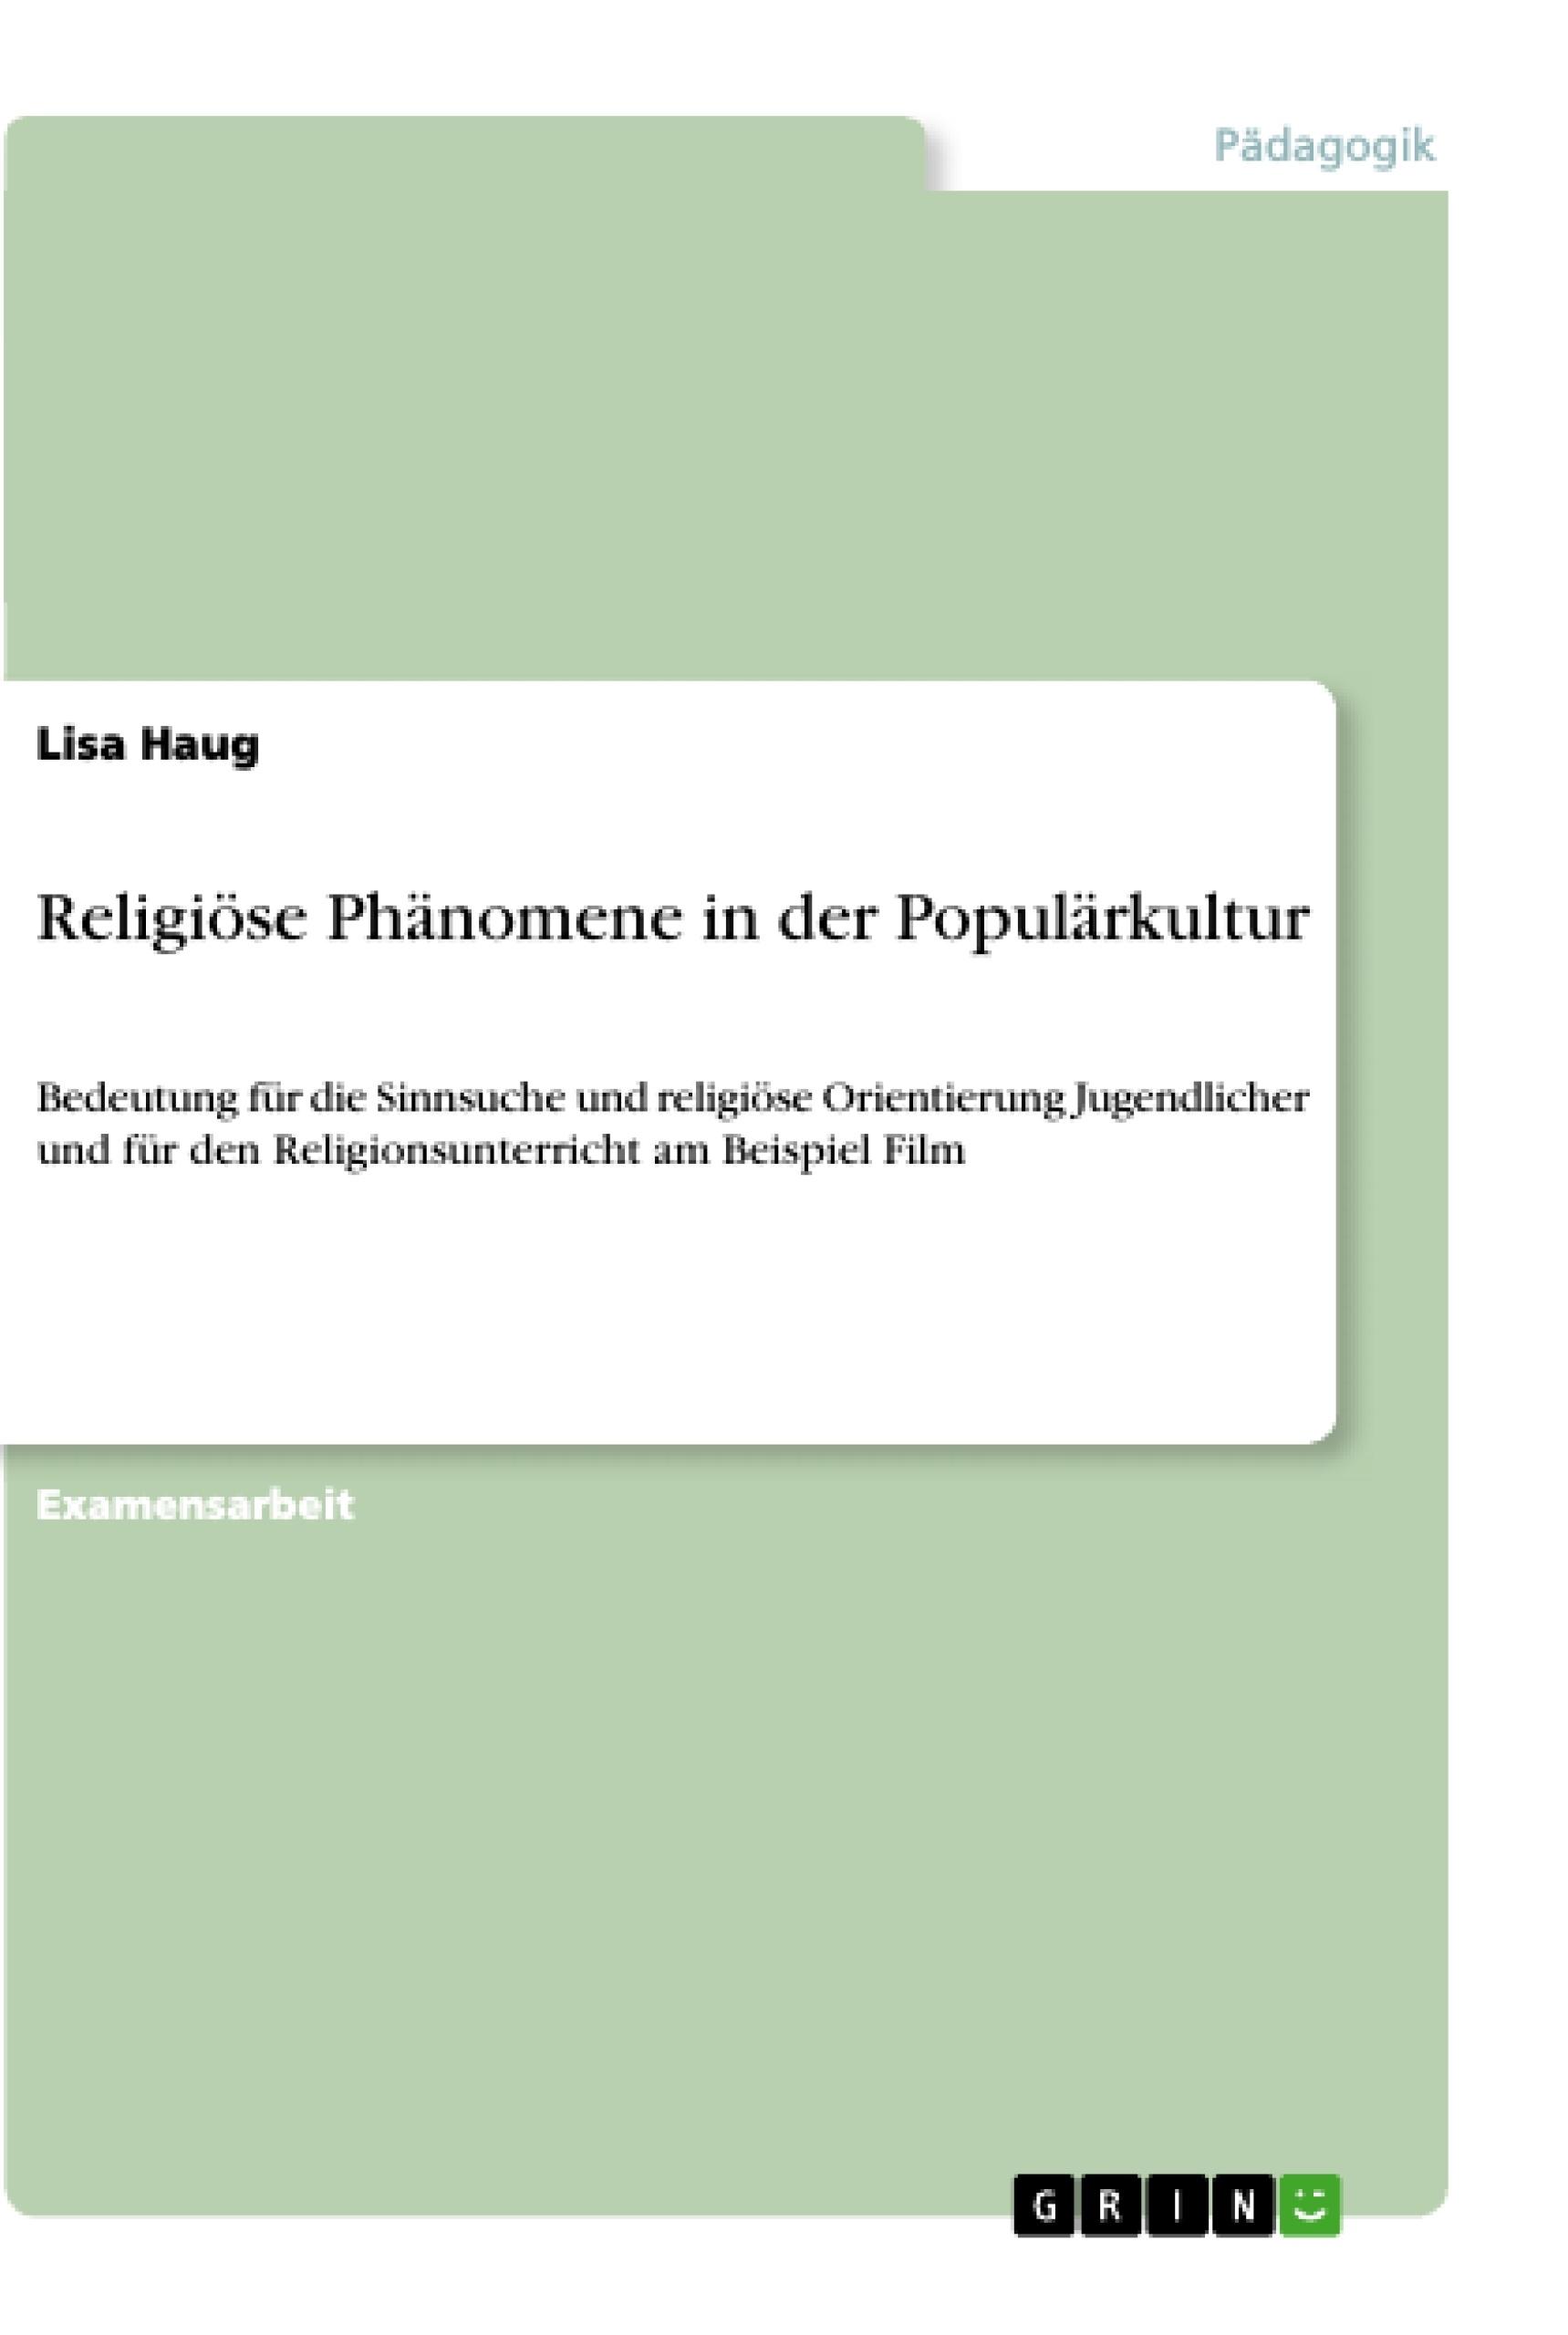 Titel: Religiöse Phänomene in der Populärkultur